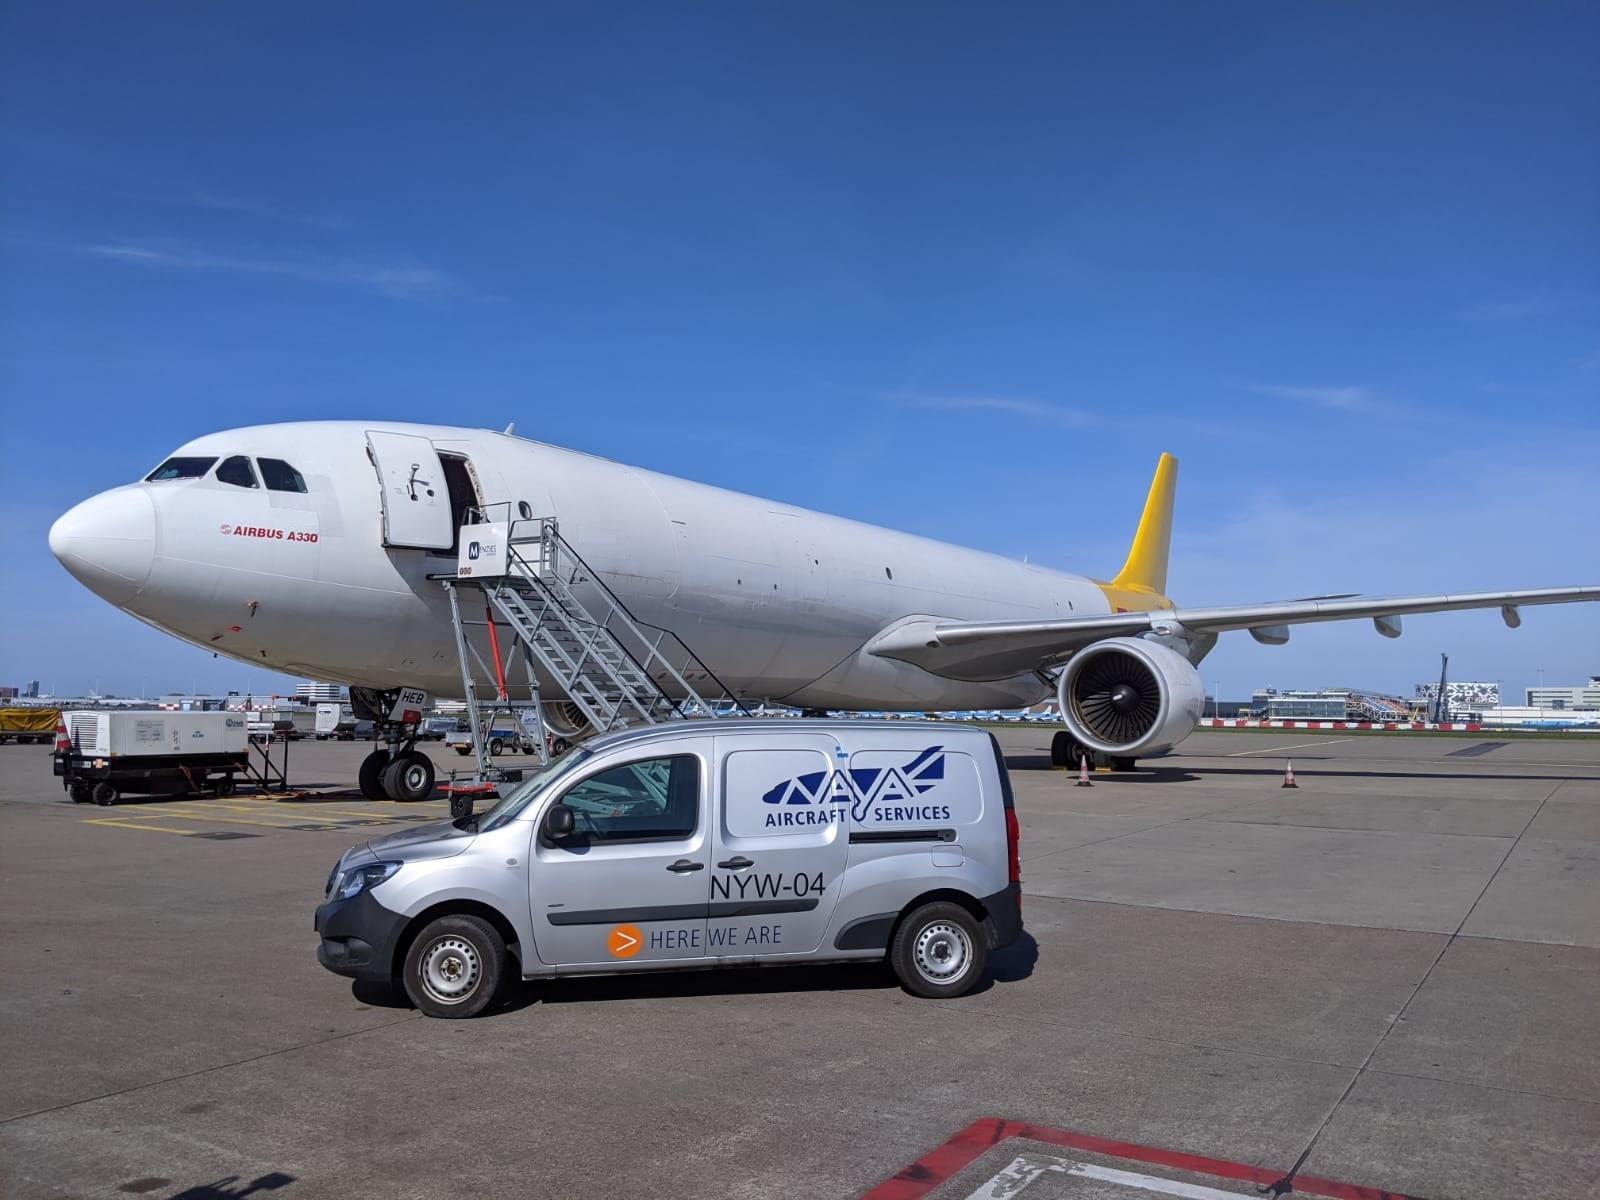 A3303-no-logo-min.jpg